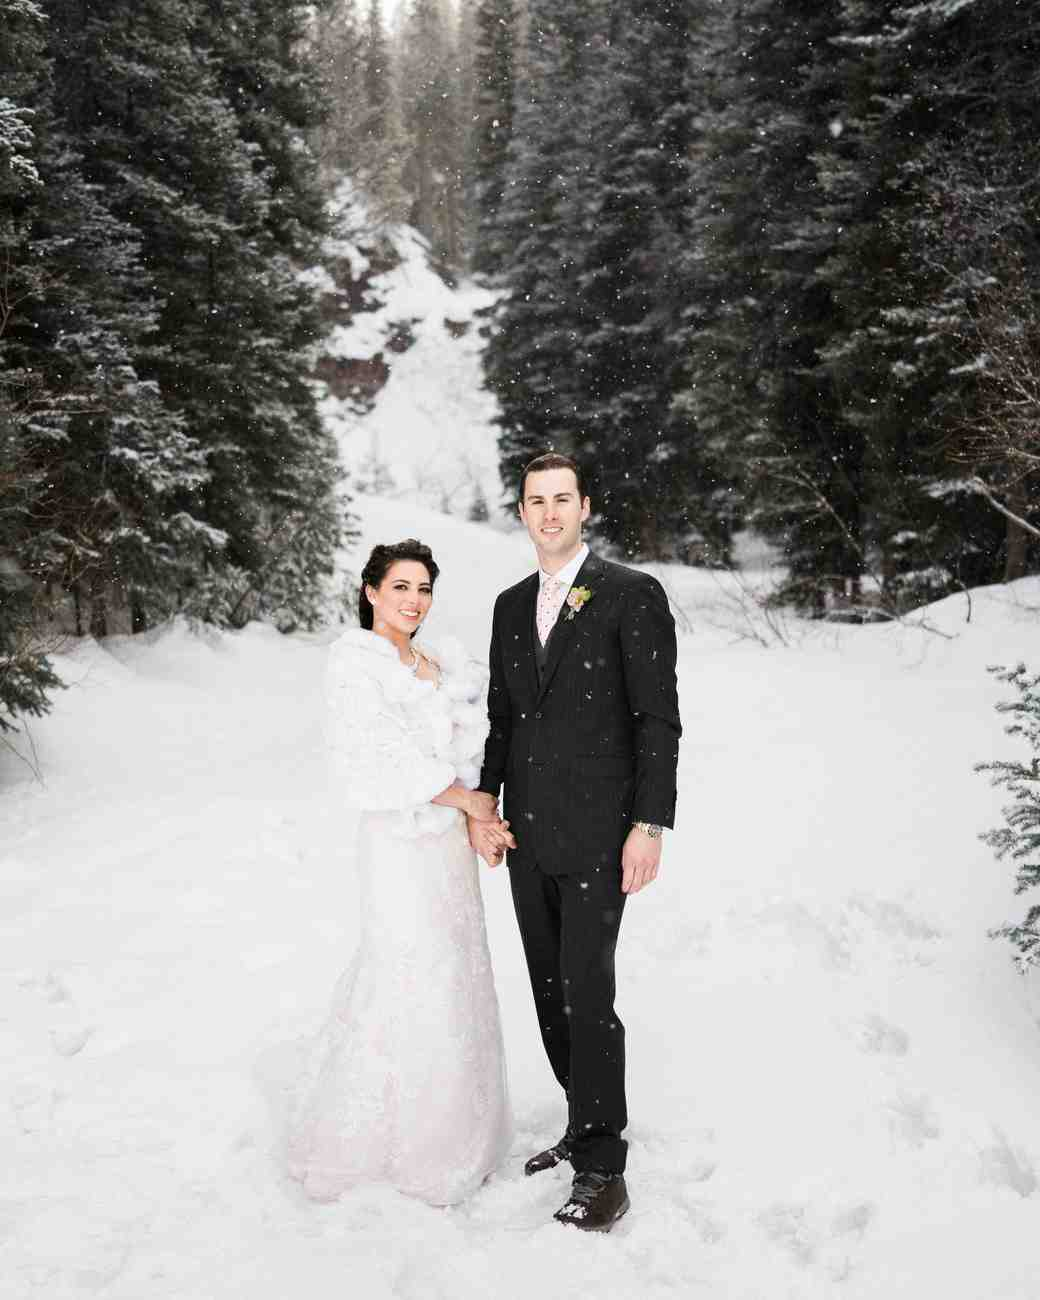 meshach-warren-wedding-couple-0358-6134942-0716.jpg